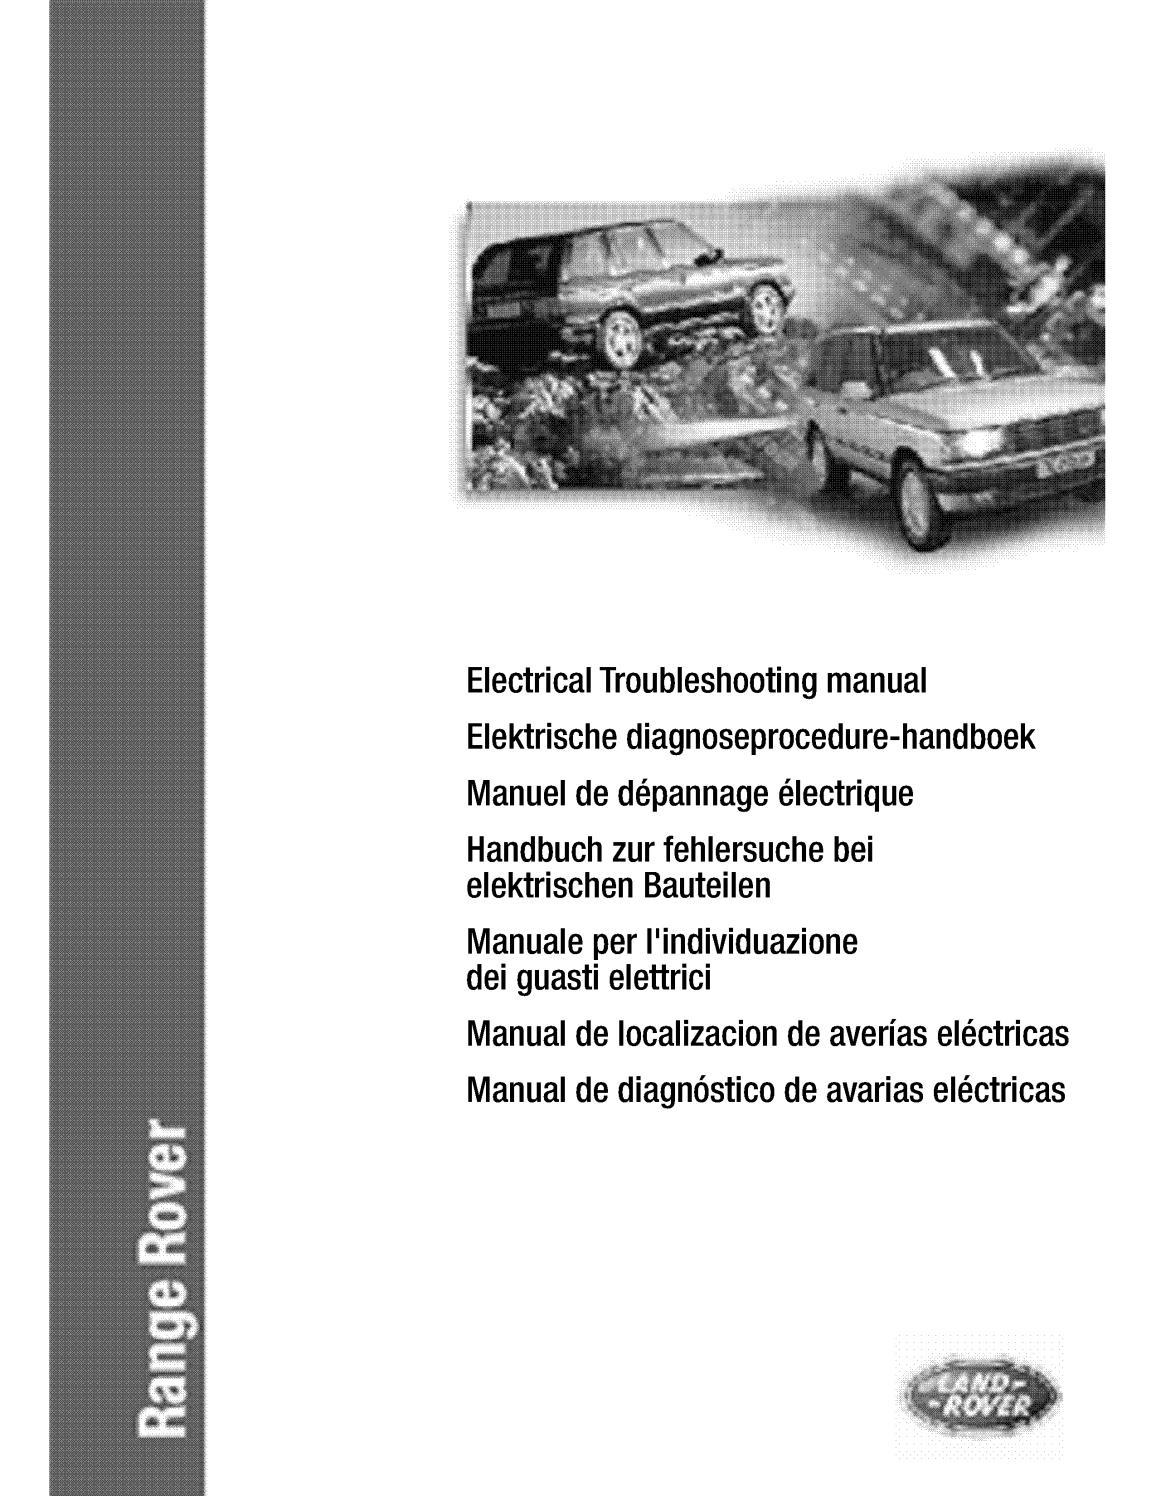 40 Models onward Range Rover Electrical Troubleshooting Manual ...